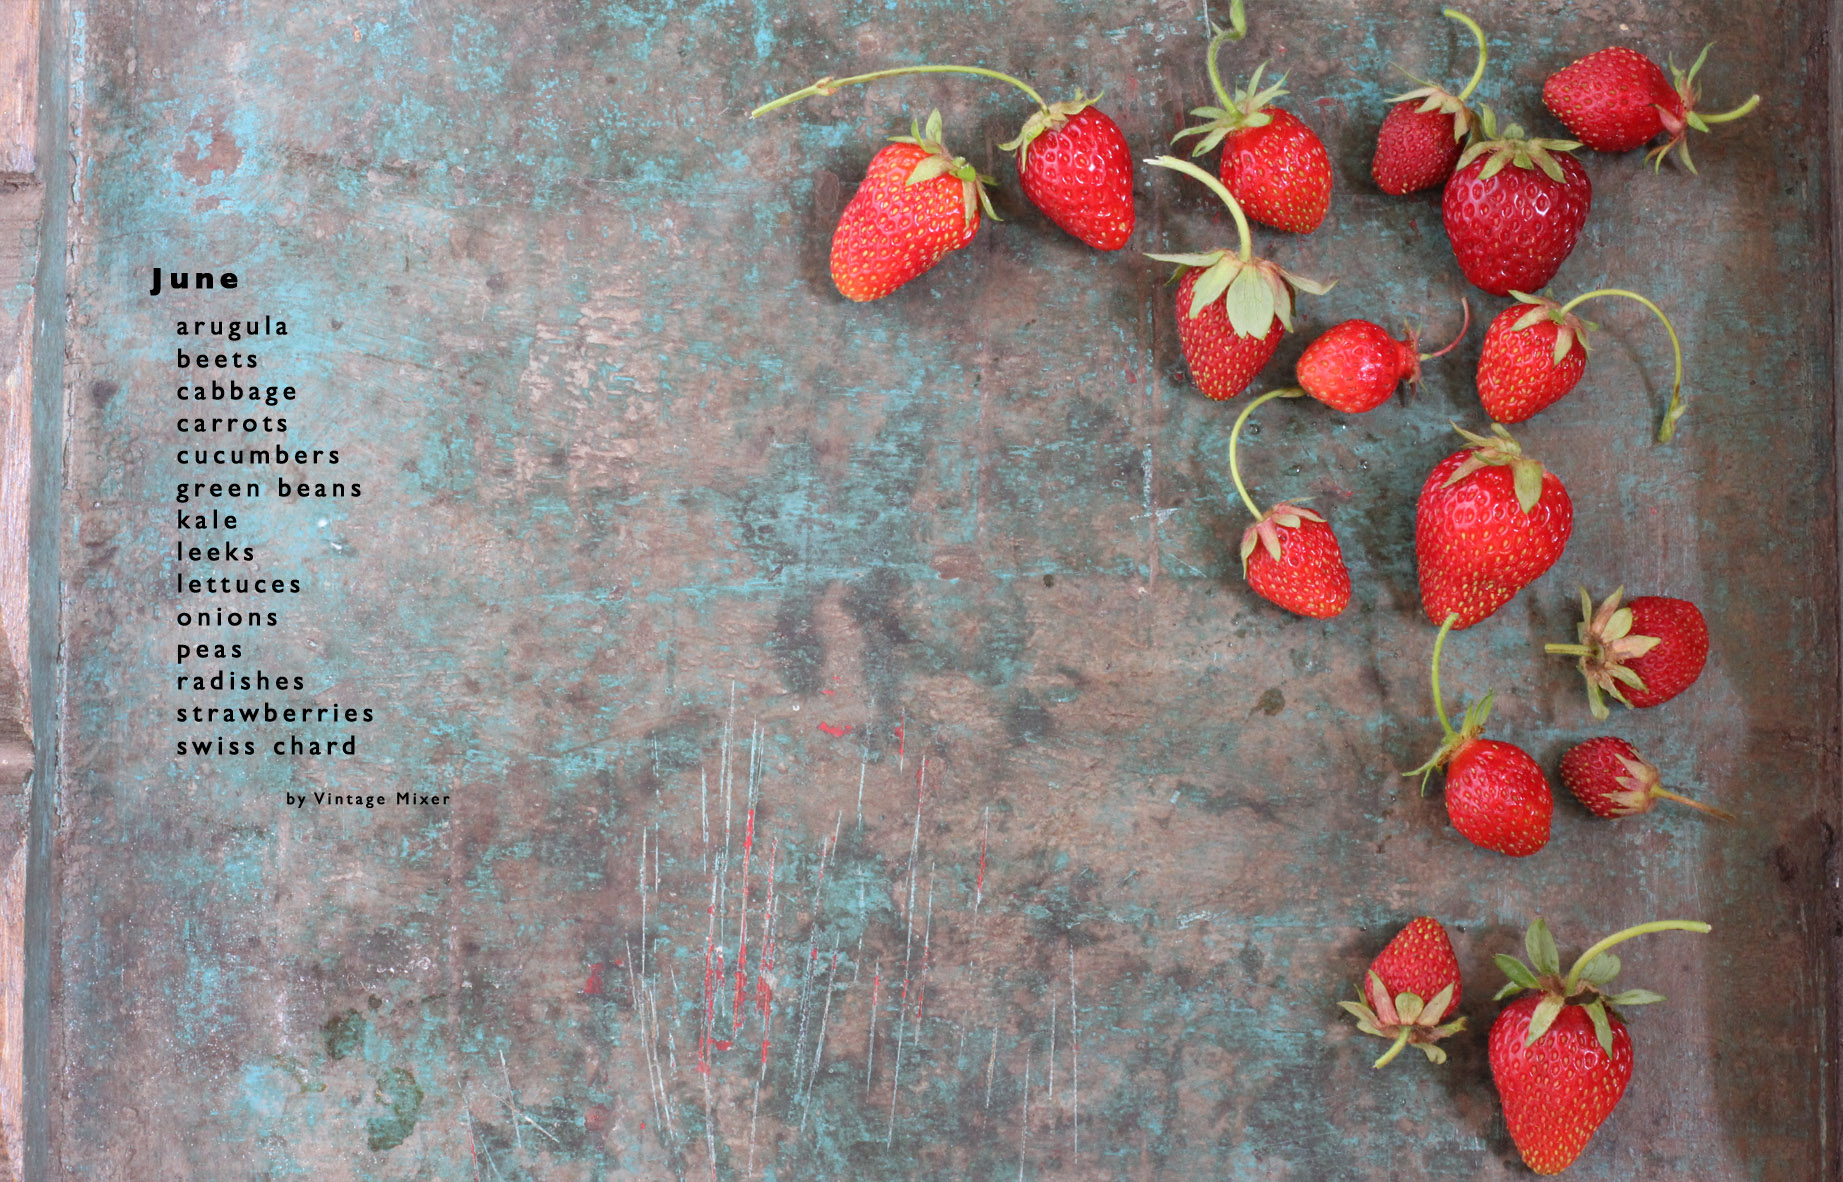 Seasonal Produce For June Vintage Mixer